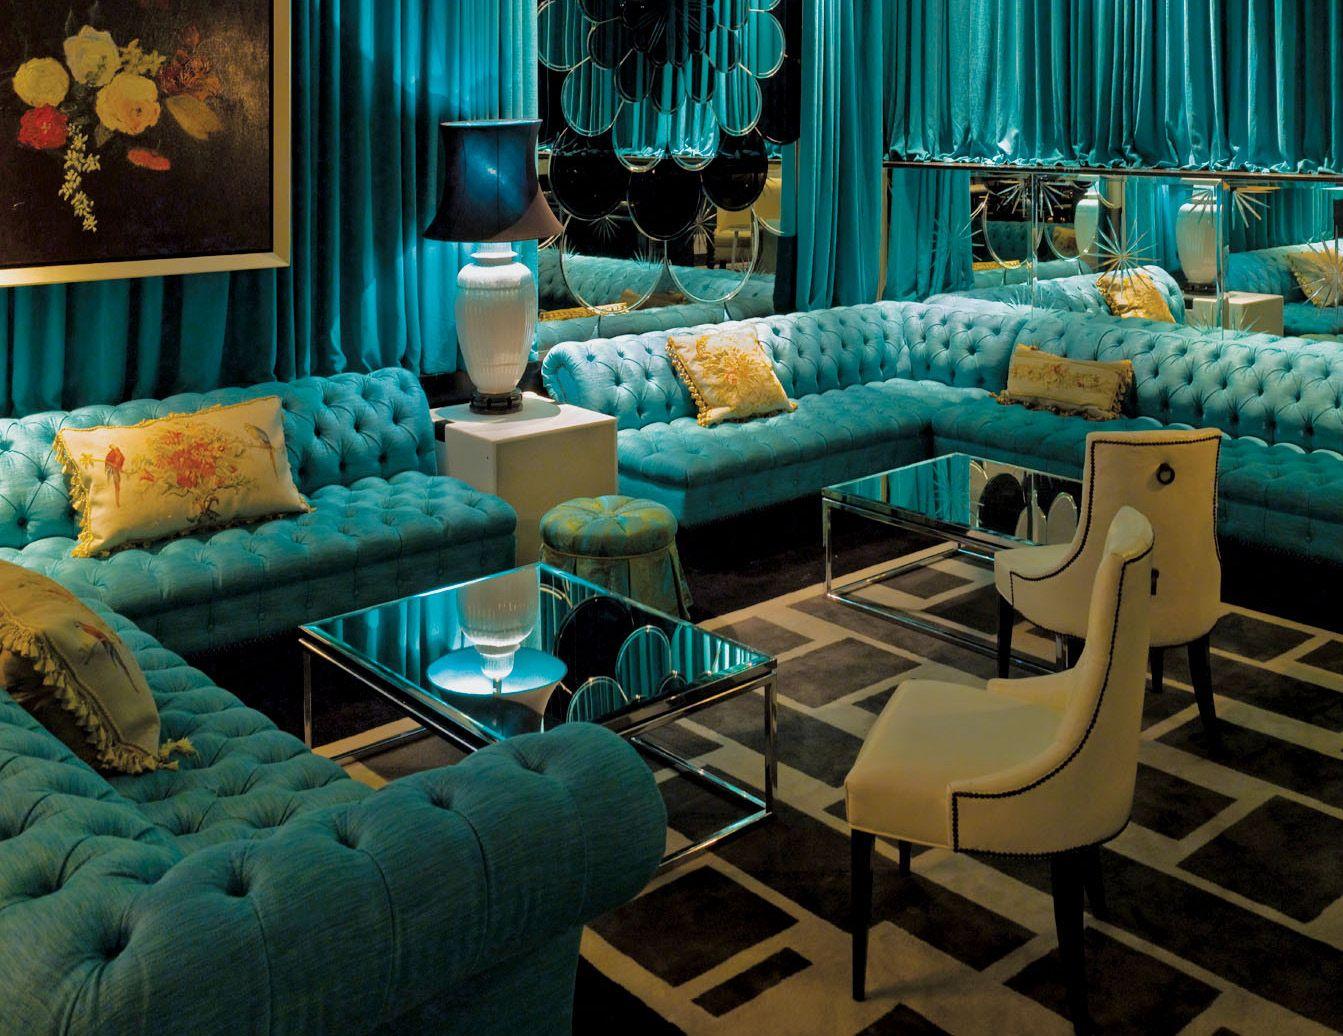 The Ivy Bar Sydney Exclusive Restaurants Design Amazing Restaurant Interior Design You Must Living Room Turquoise Turquoise Living Room Decor Turquoise Room